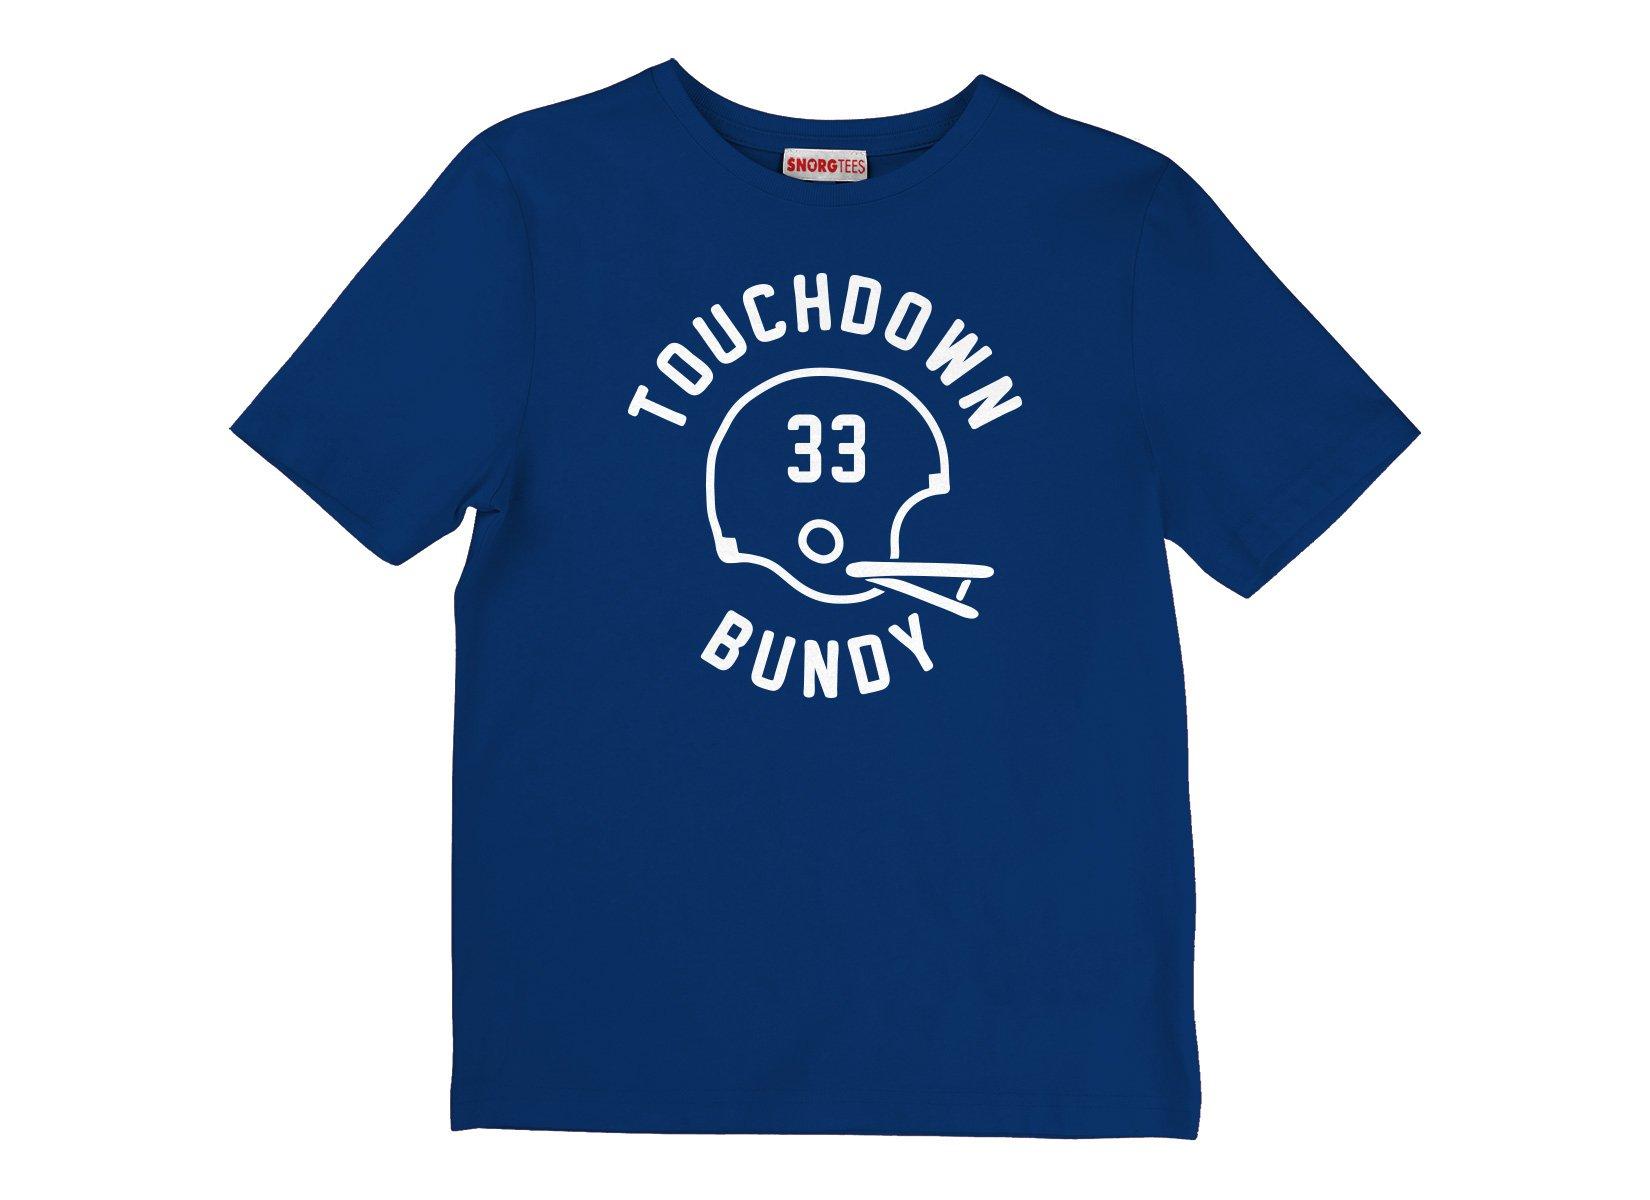 Touchdown Bundy on Kids T-Shirt